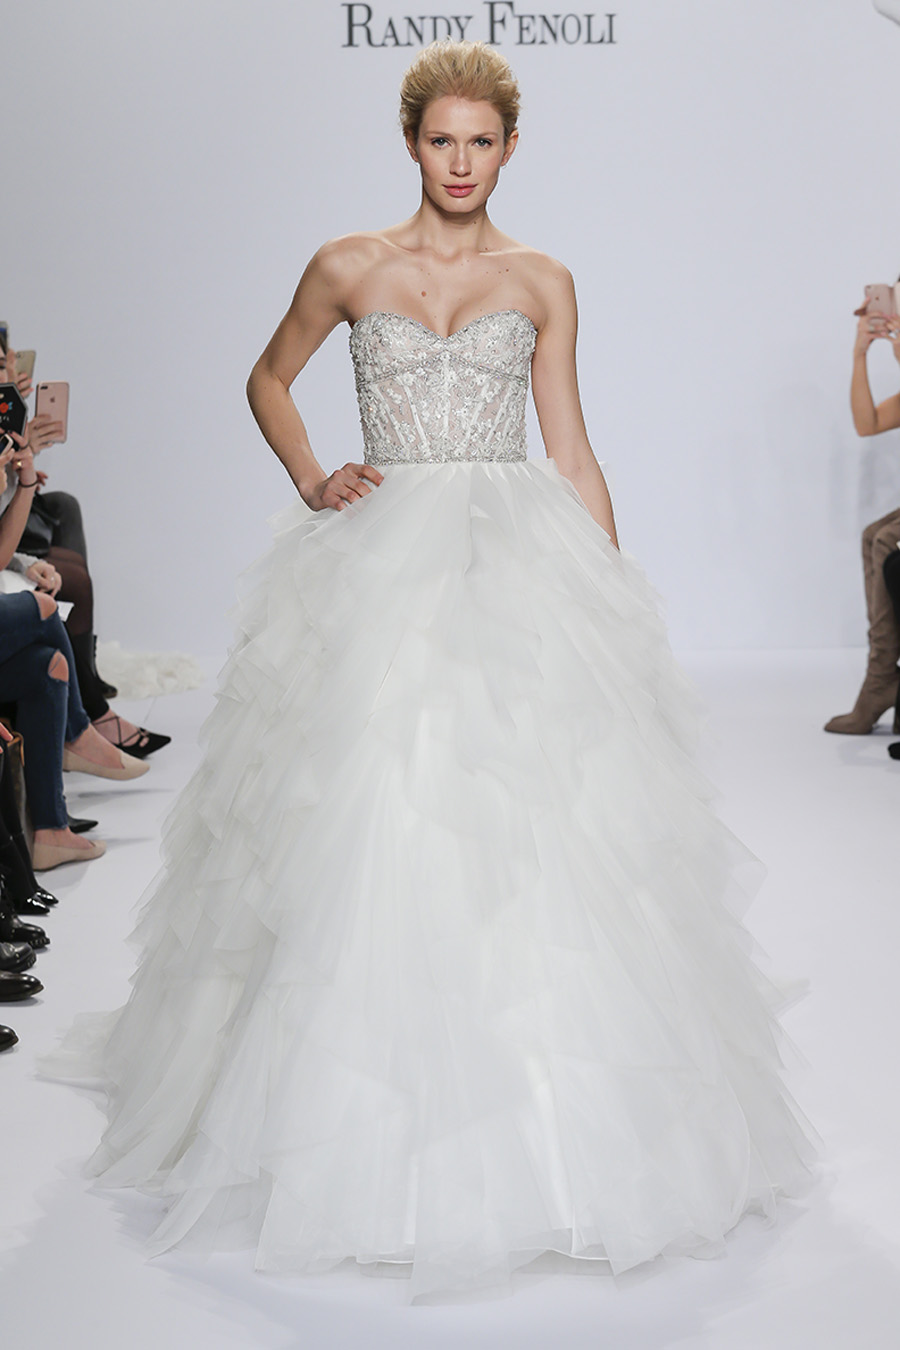 Randy Fenoli Bridal Collection gown 3